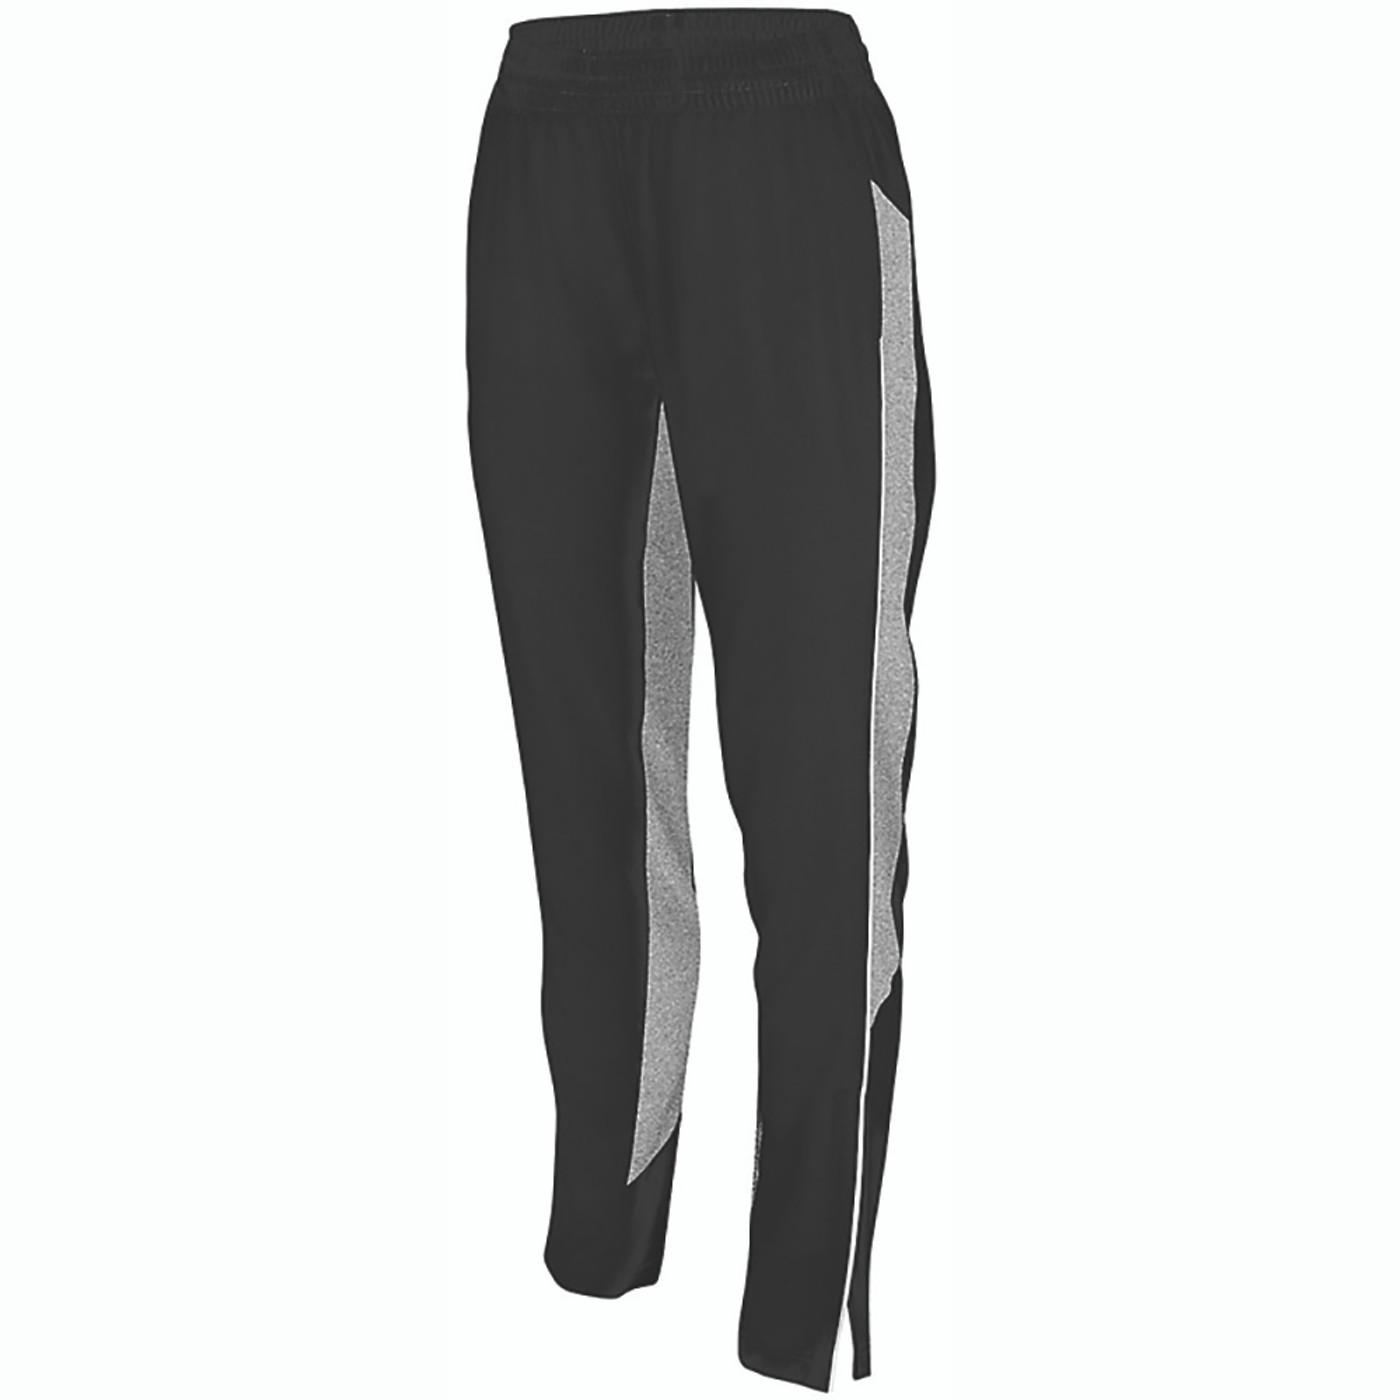 W1199P Women's Tapered Training Pant